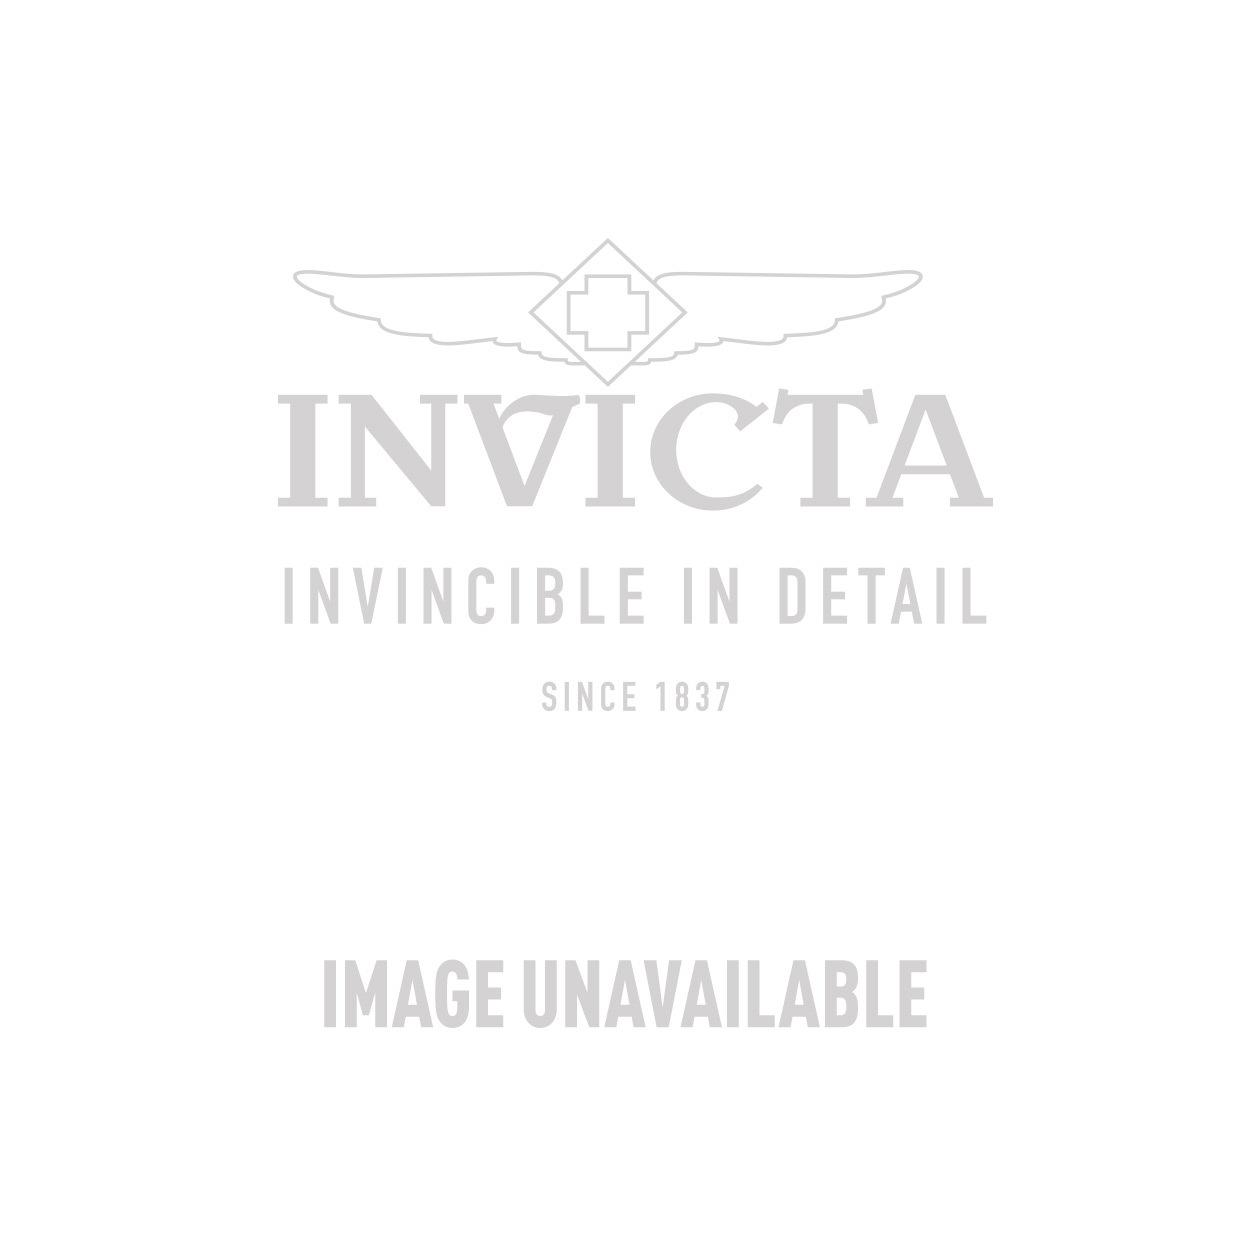 Invicta Venom Swiss Made Quartz Watch - Stainless Steel case with Steel, Black tone Stainless Steel, Polyurethane band - Model 6105